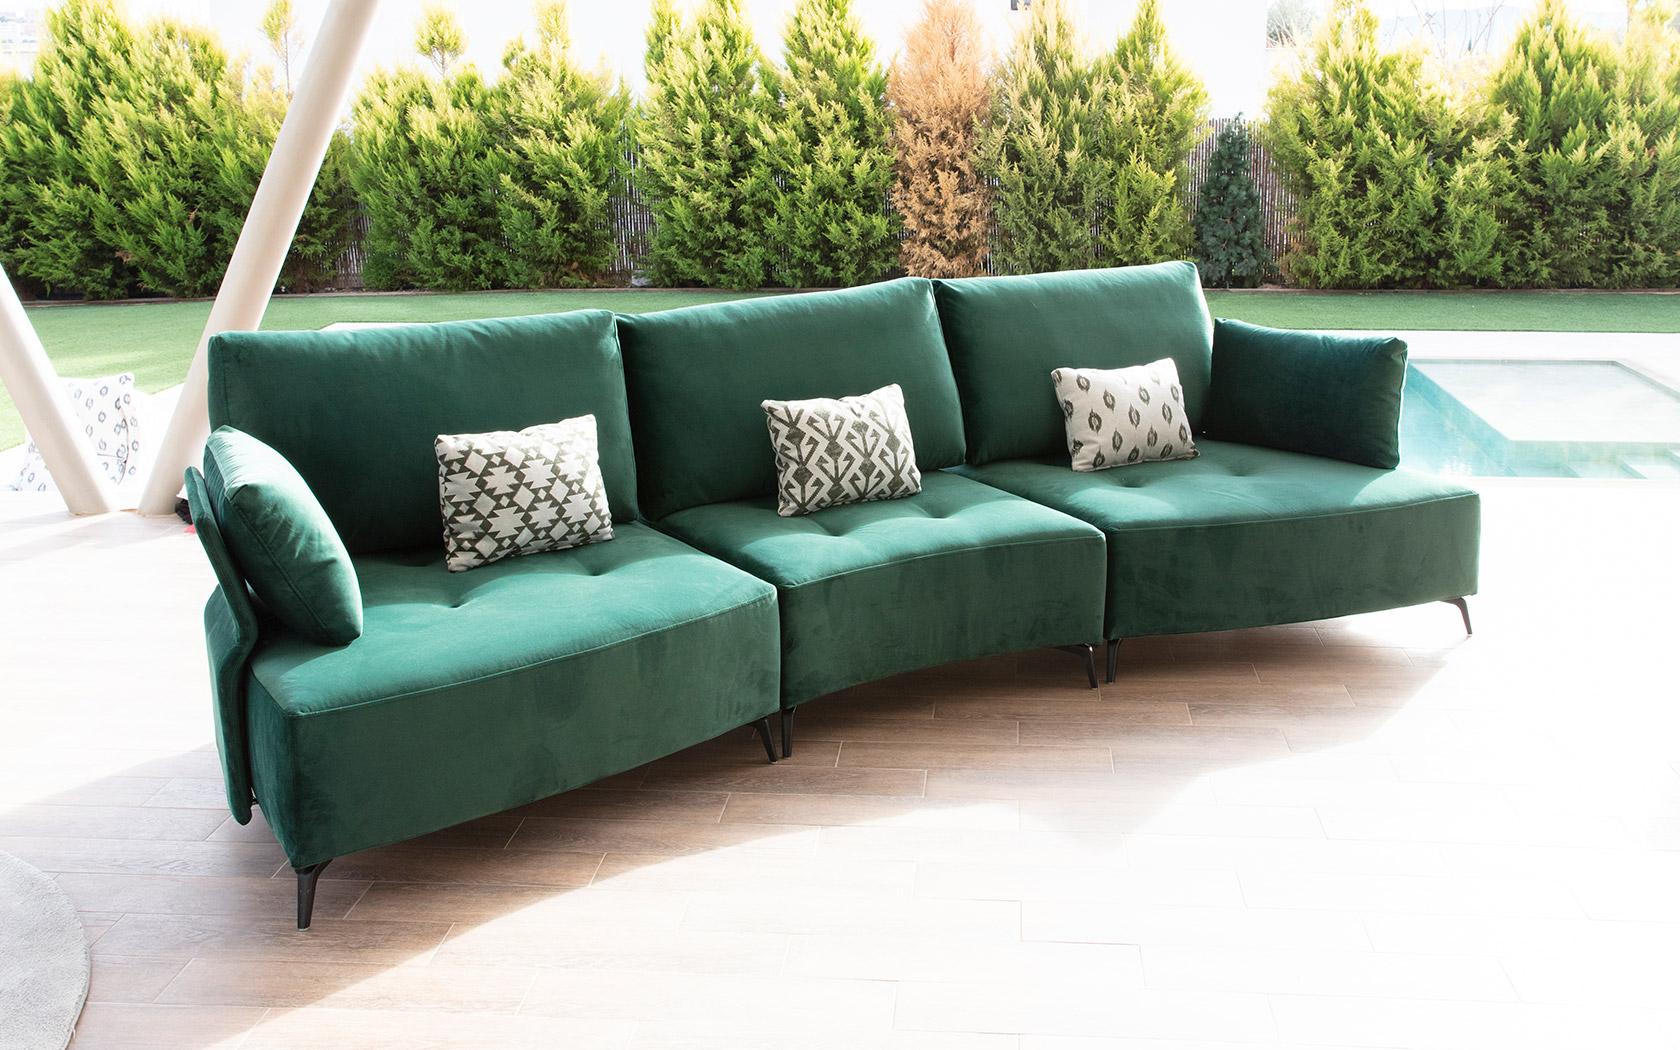 kalahari sofa 2021 03